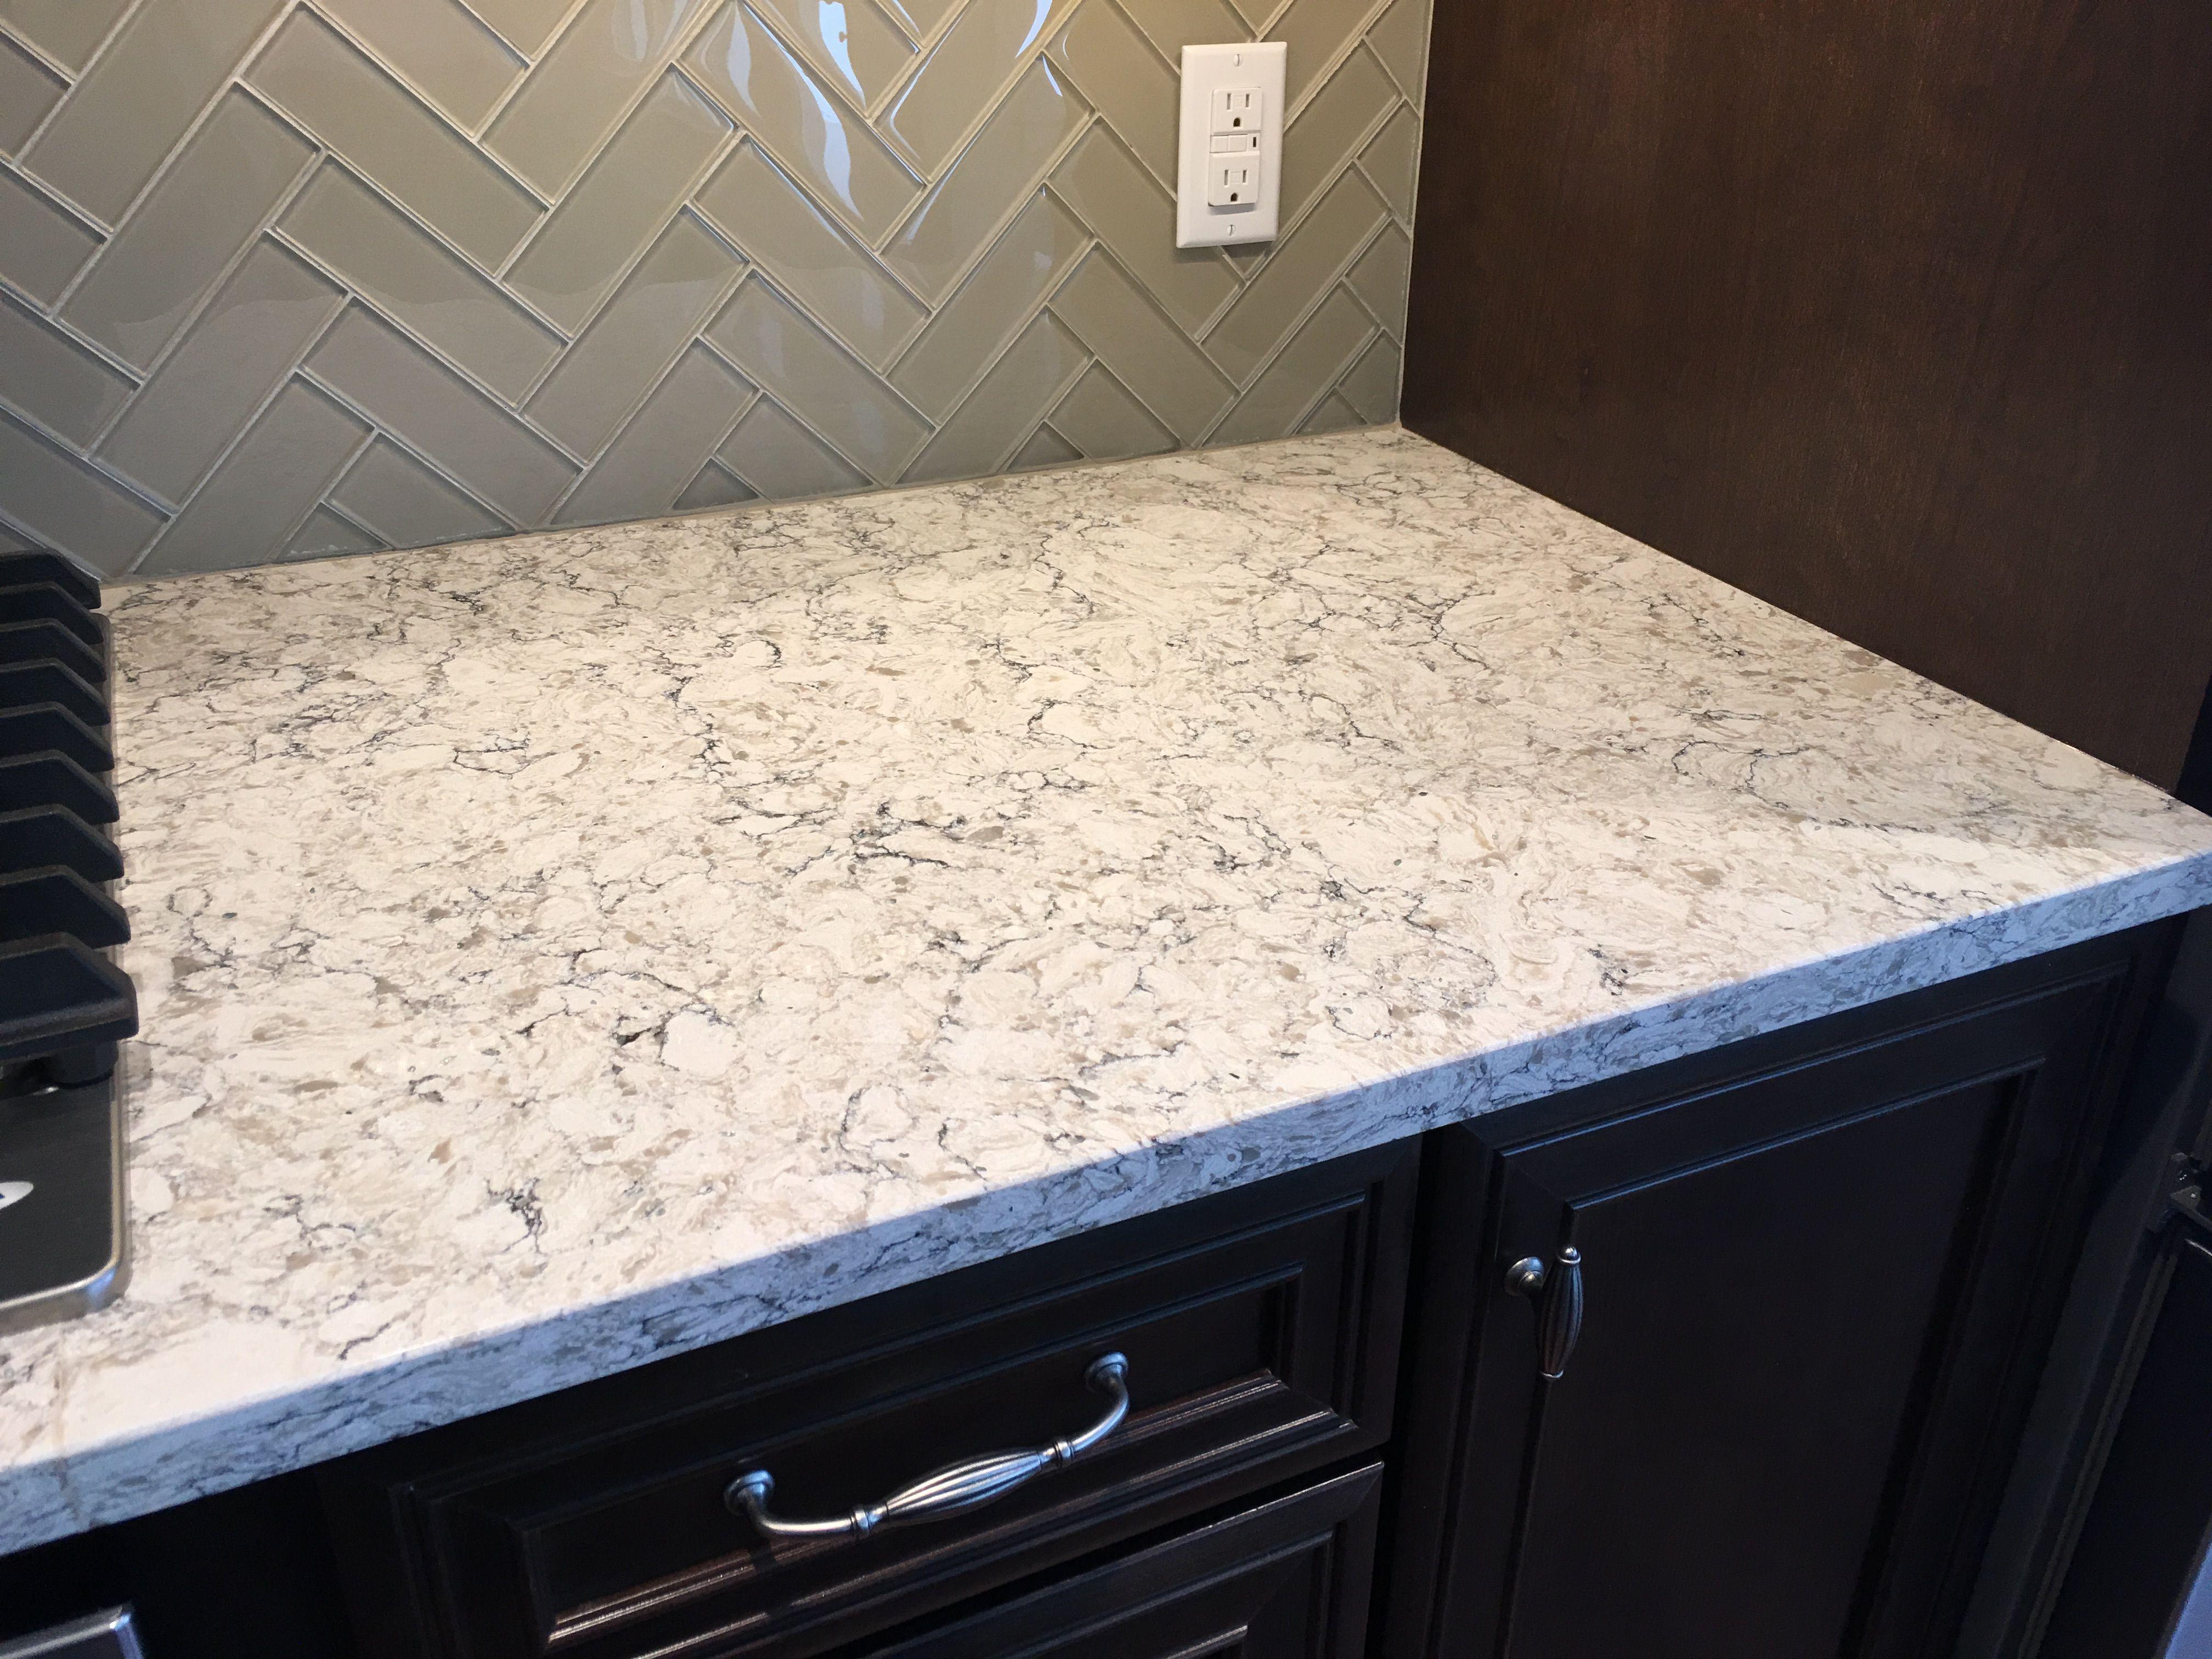 Viatera Quartz Countertop In Aria Quartz Kitchen Countertops Beadboard Backsplash Quartz Countertops